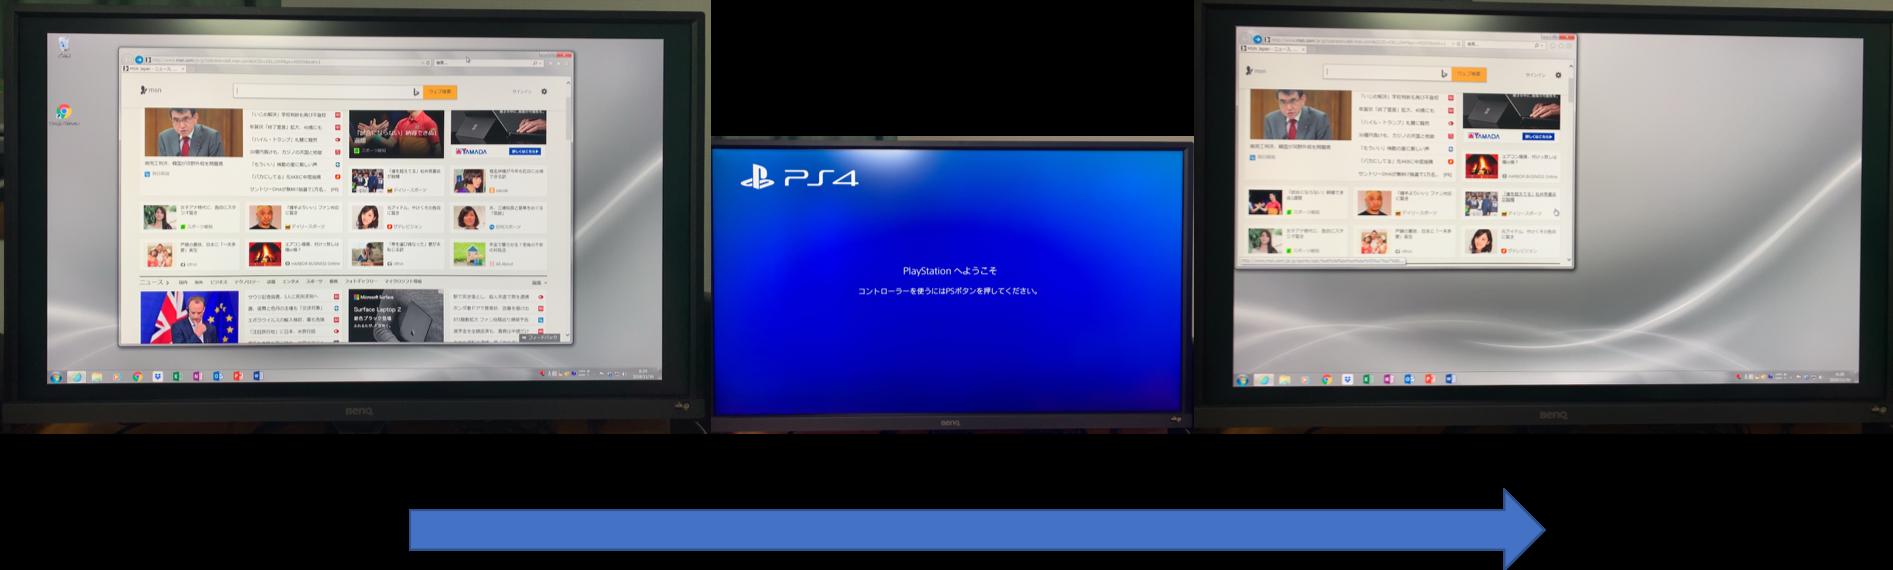 Monitor表示変化